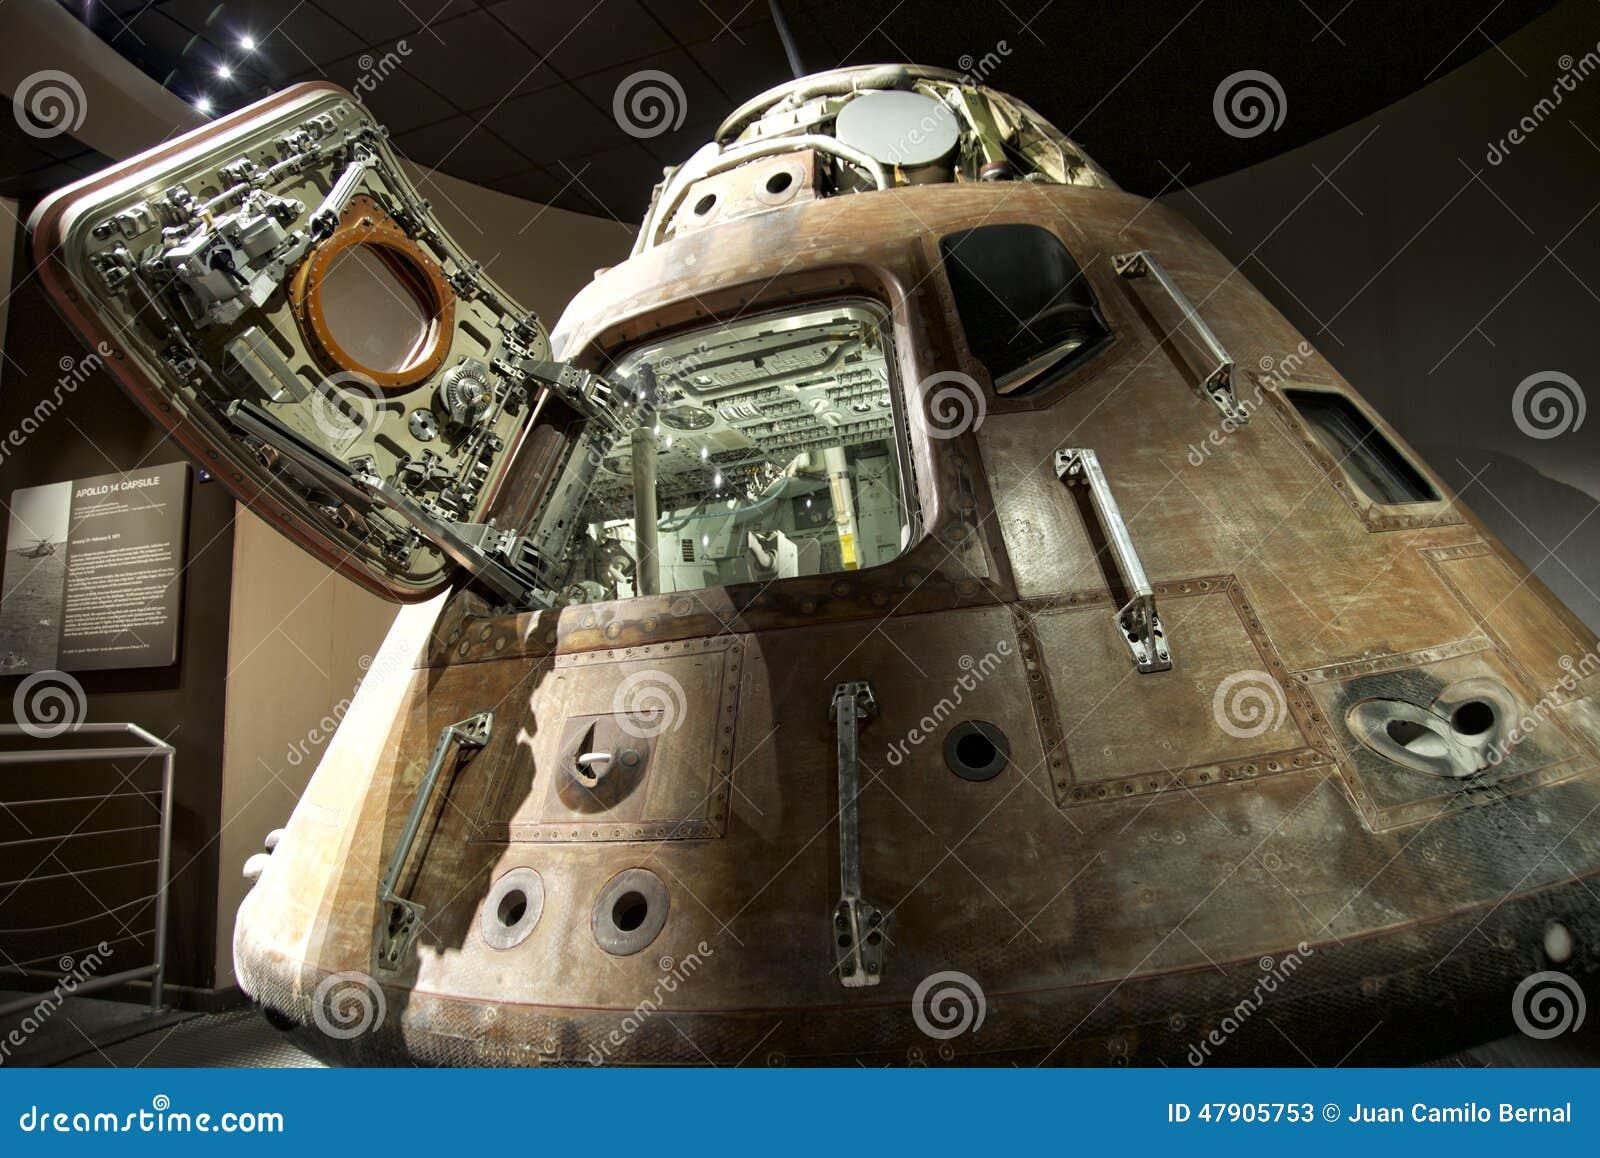 apollo 3 capsule - photo #3